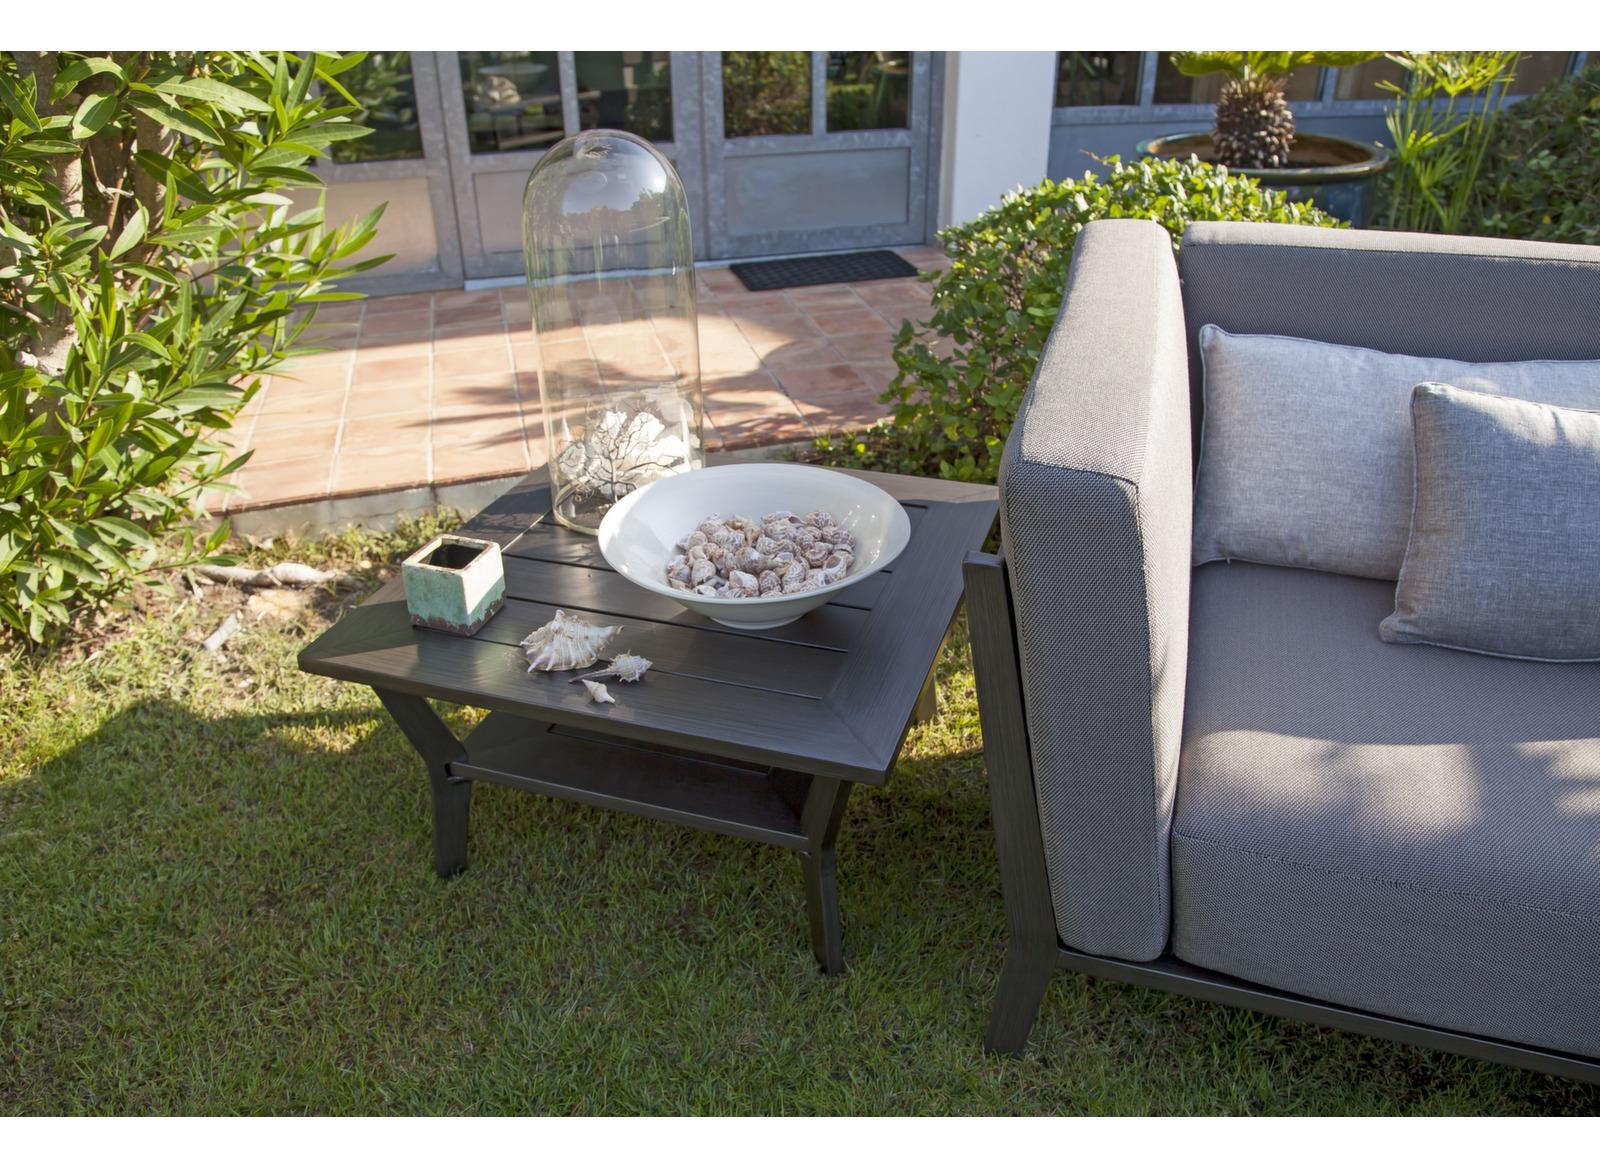 Table basse de jardin 2 niveaux alu gris 66cm sofa oc o for Jardin 2 niveaux